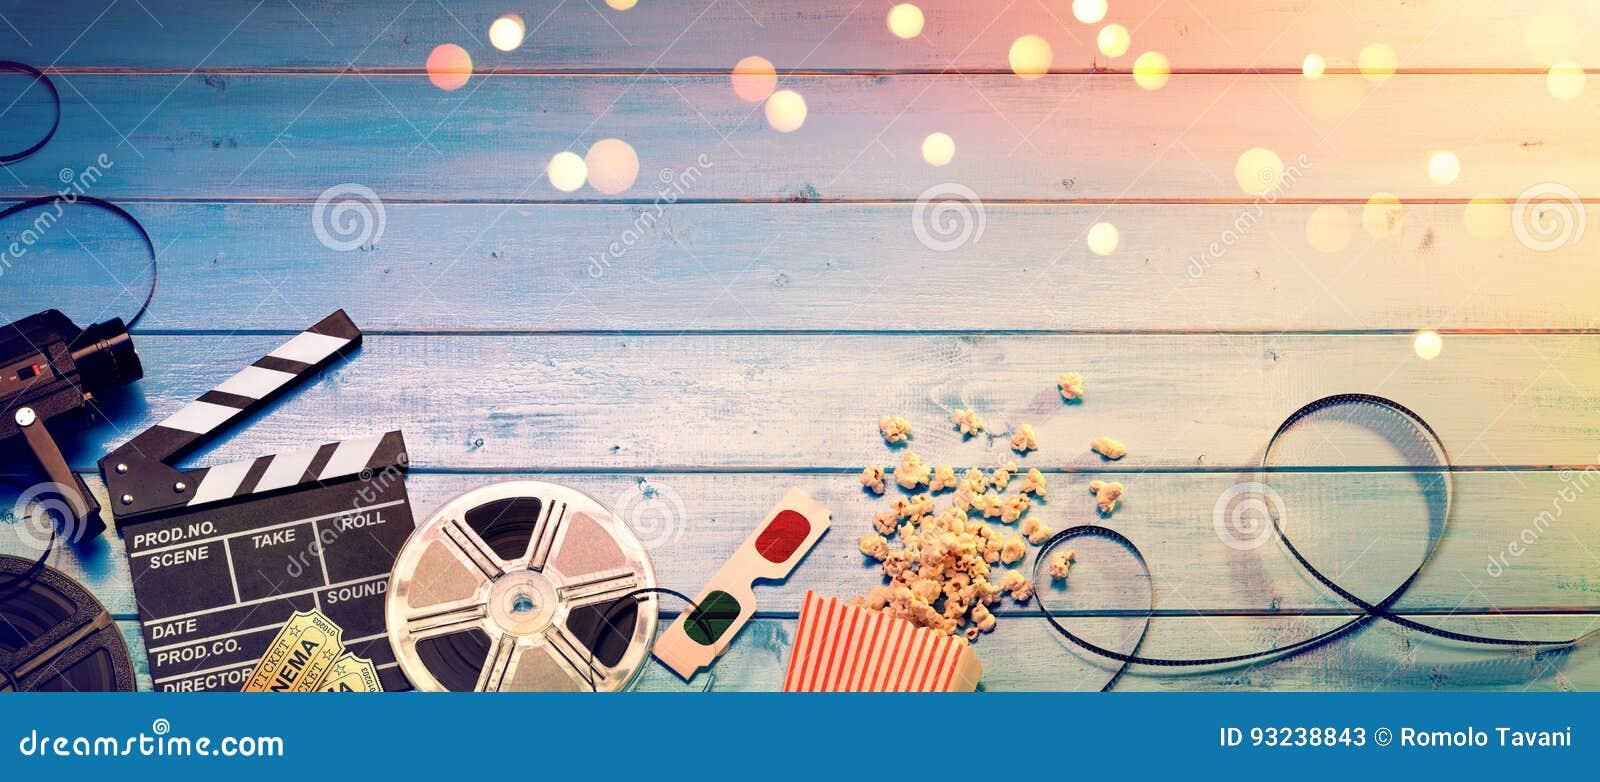 Предпосылка фильма кино - винтажное влияние - камера с Clapperboard